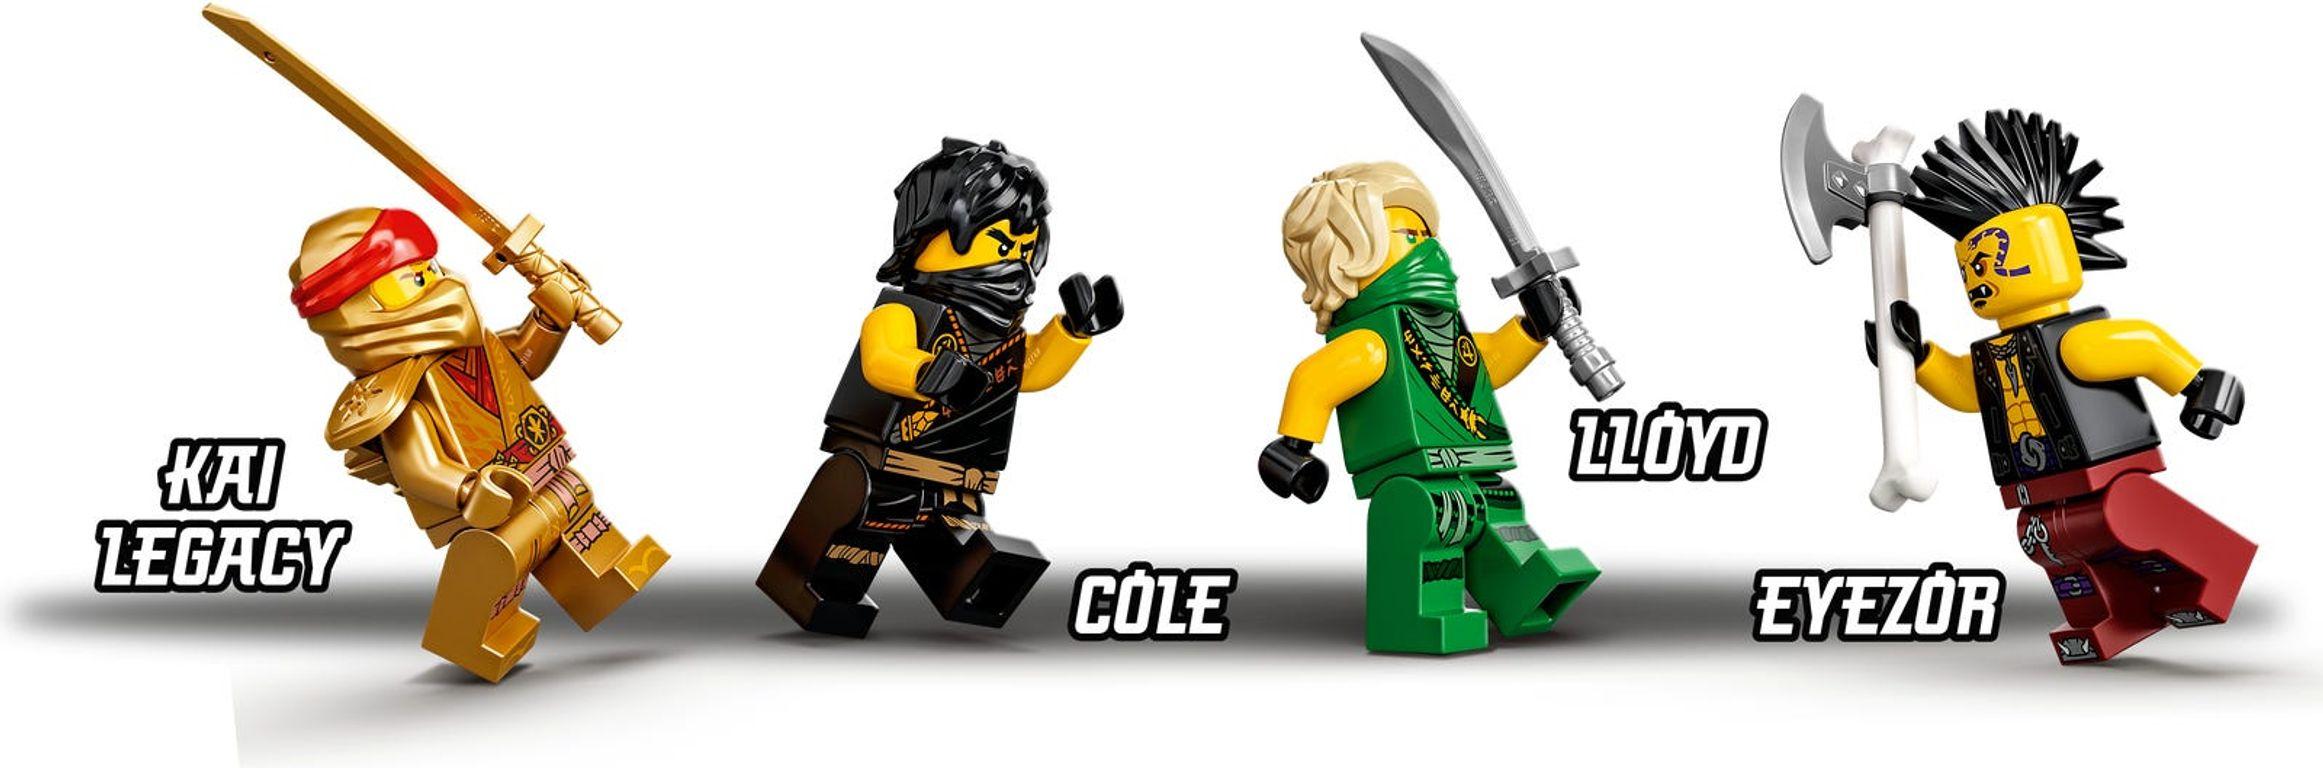 LEGO® Ninjago Boulder Blaster minifigures